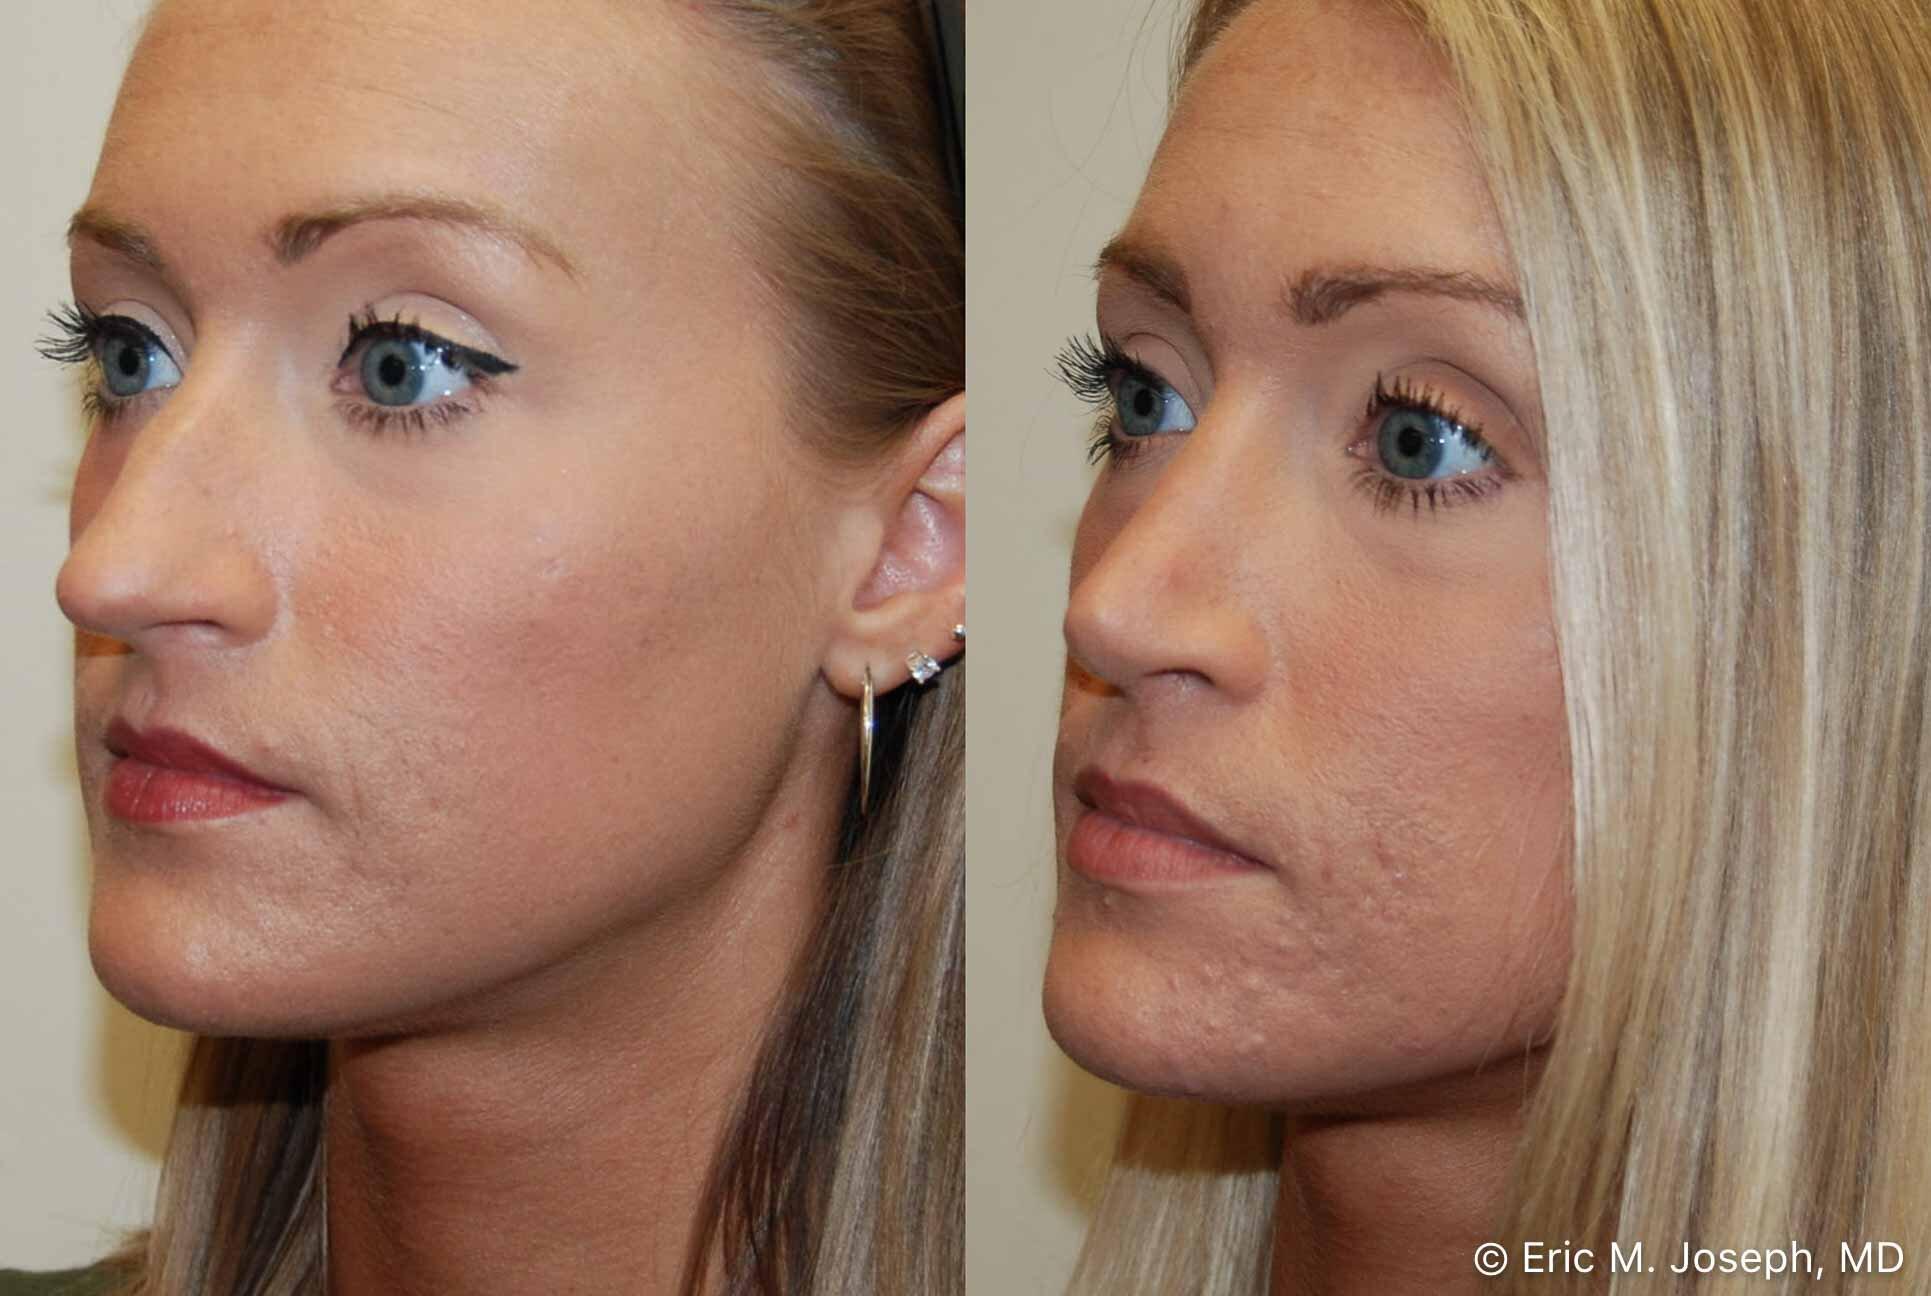 rhinoplasty-nj-nose-job-nyc-0556.jpg